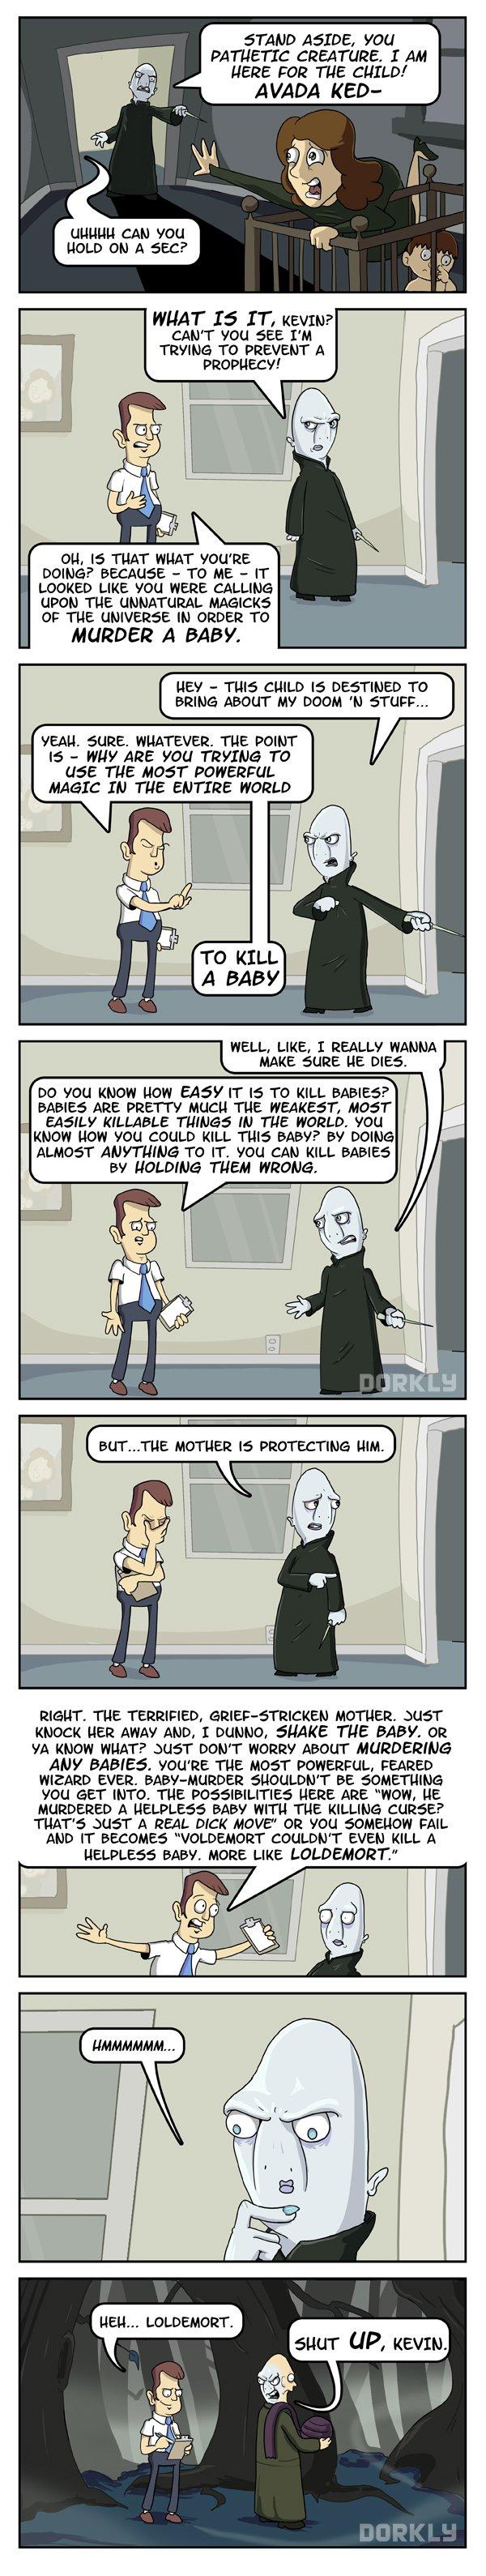 Voldemort's Assistant, Kevin - Imgur